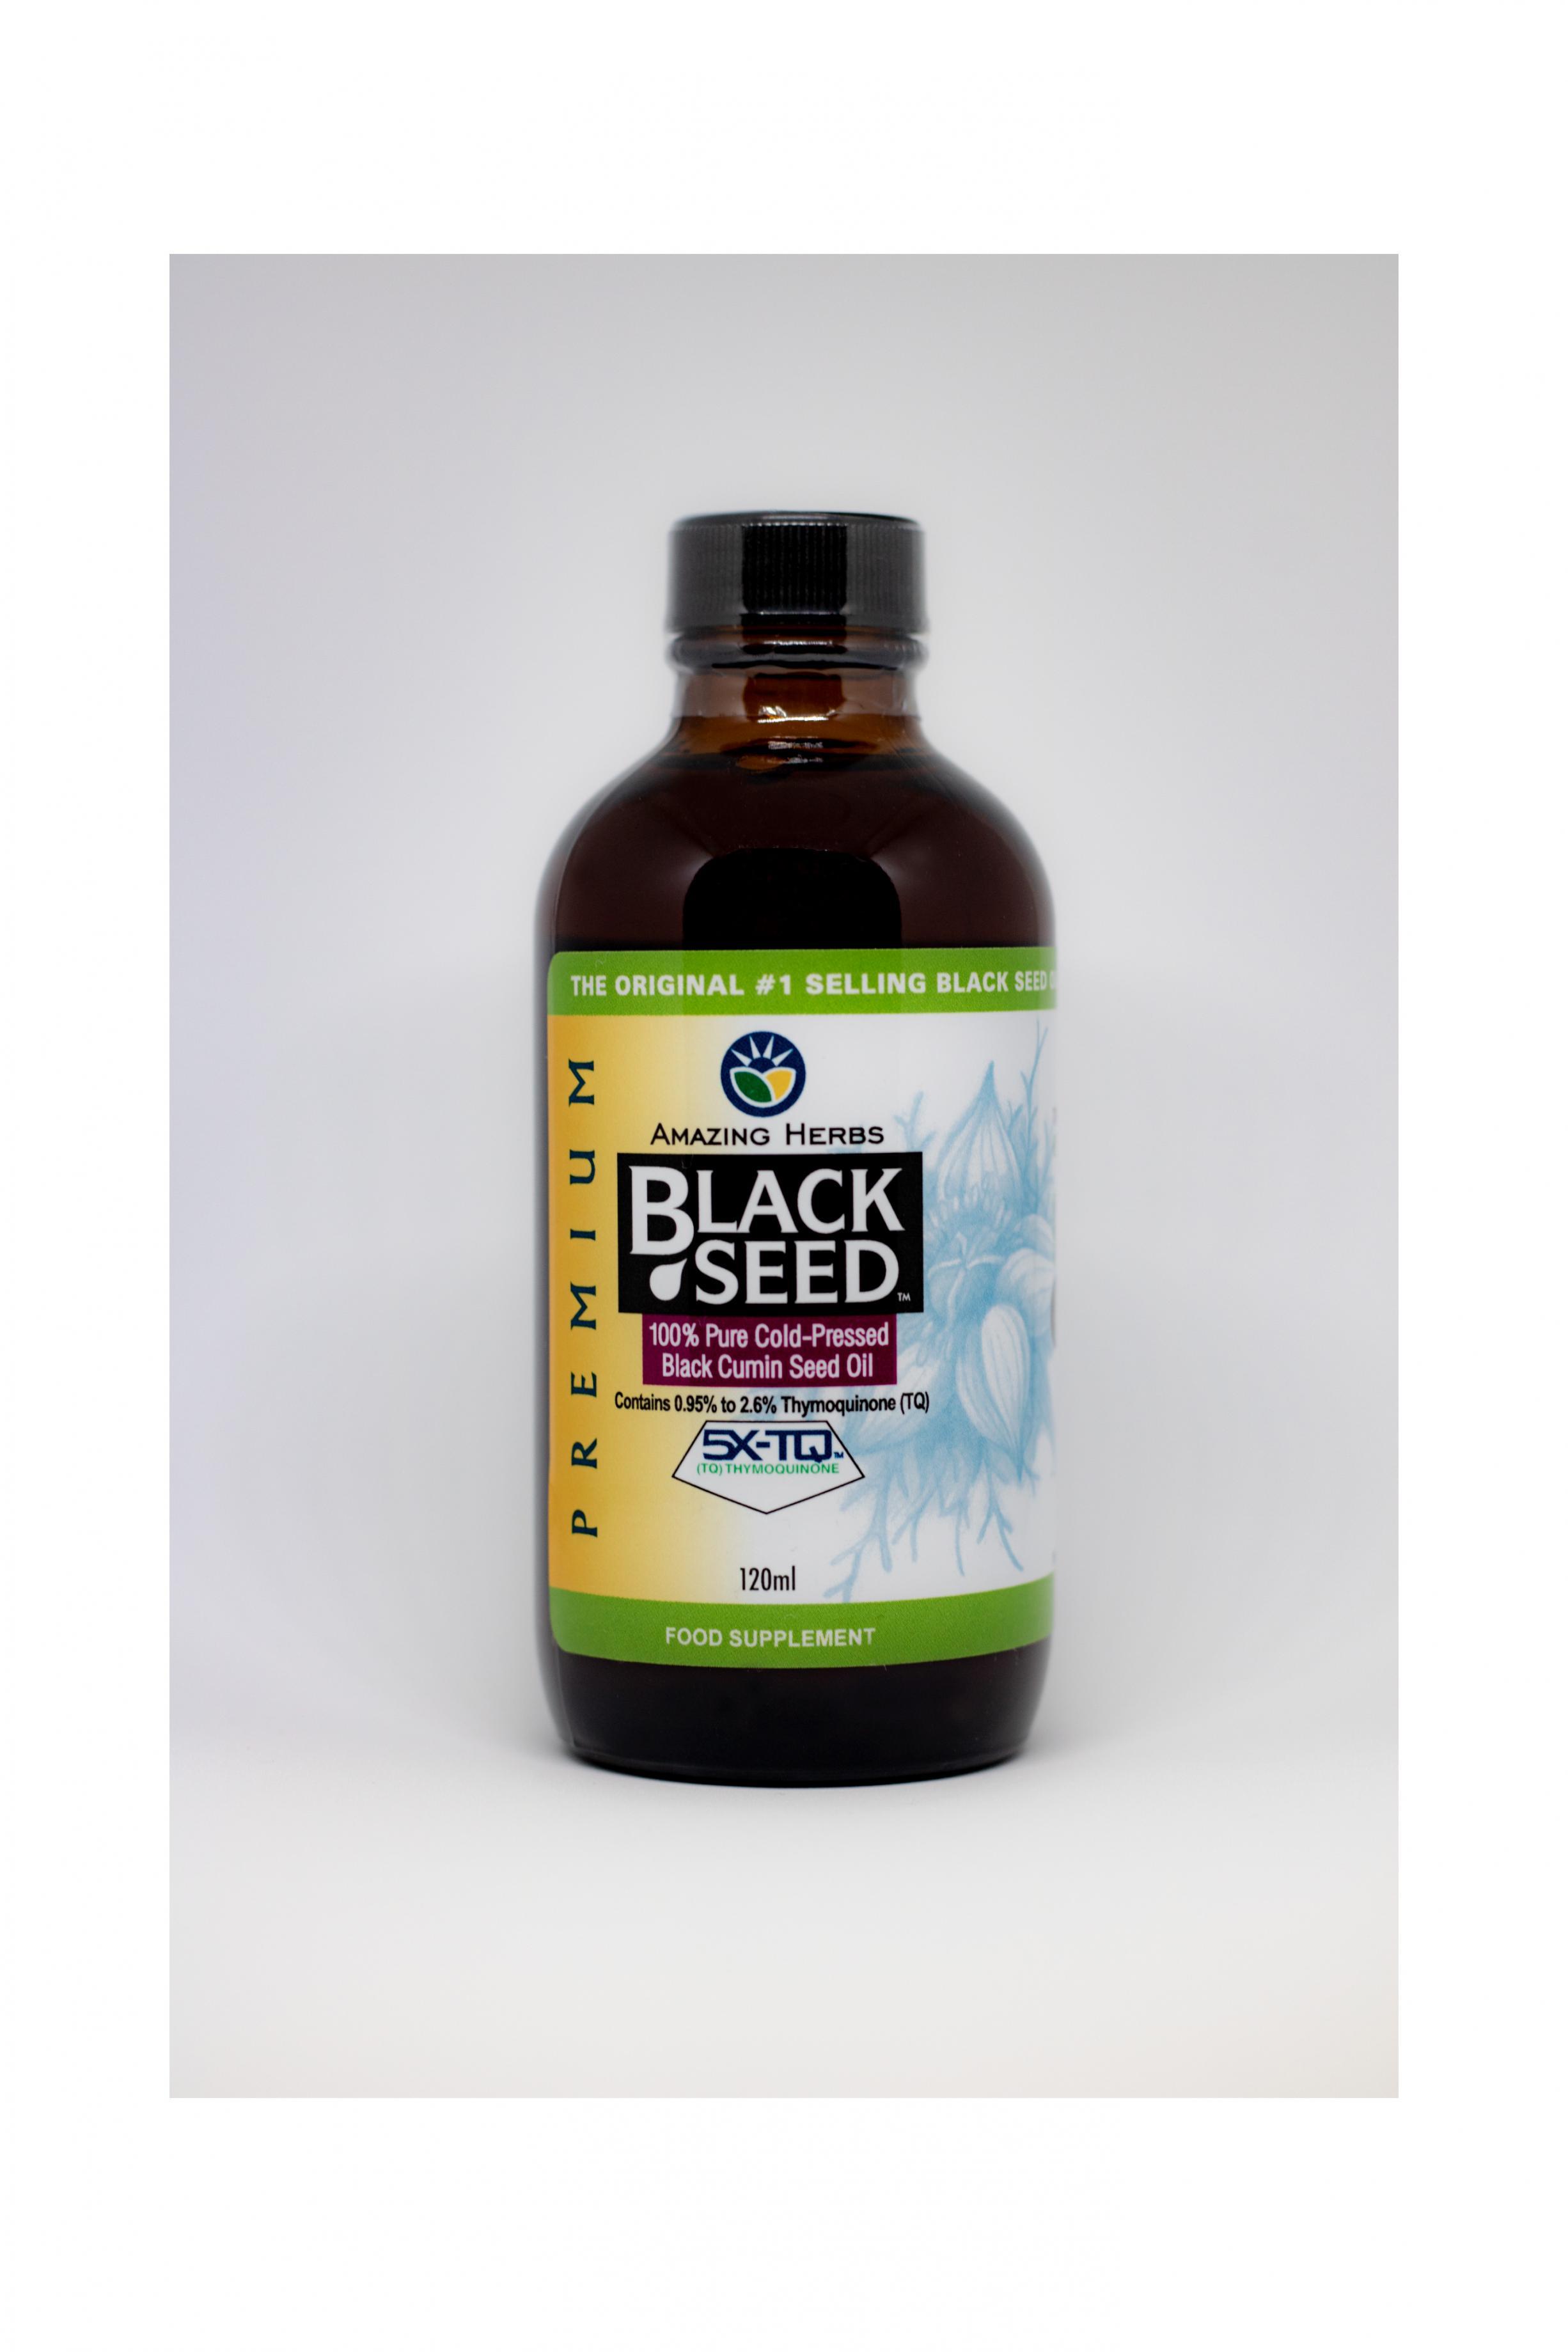 Premium Black Seed 100% Pure Cold-Pressed Black Cumin Seed Oil 120ml